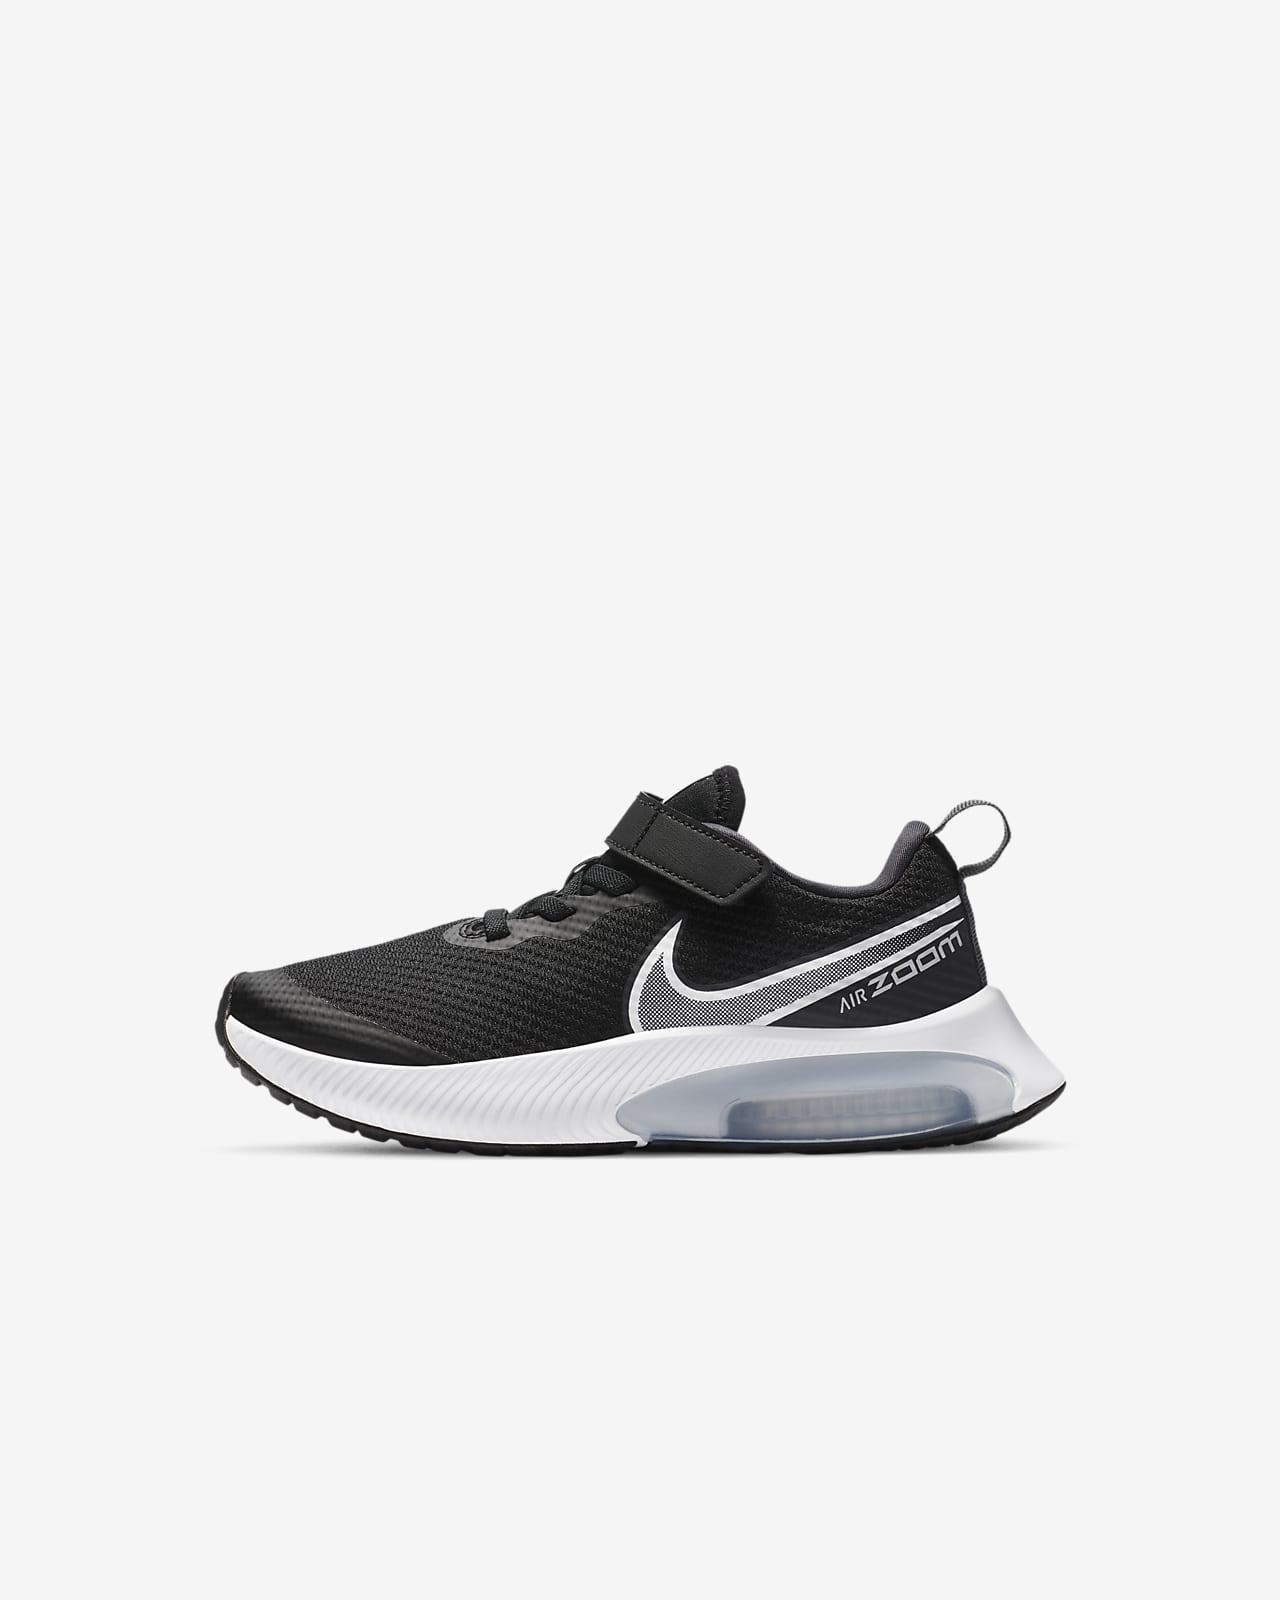 Nike Air Zoom Arcadia Little Kids' Shoe